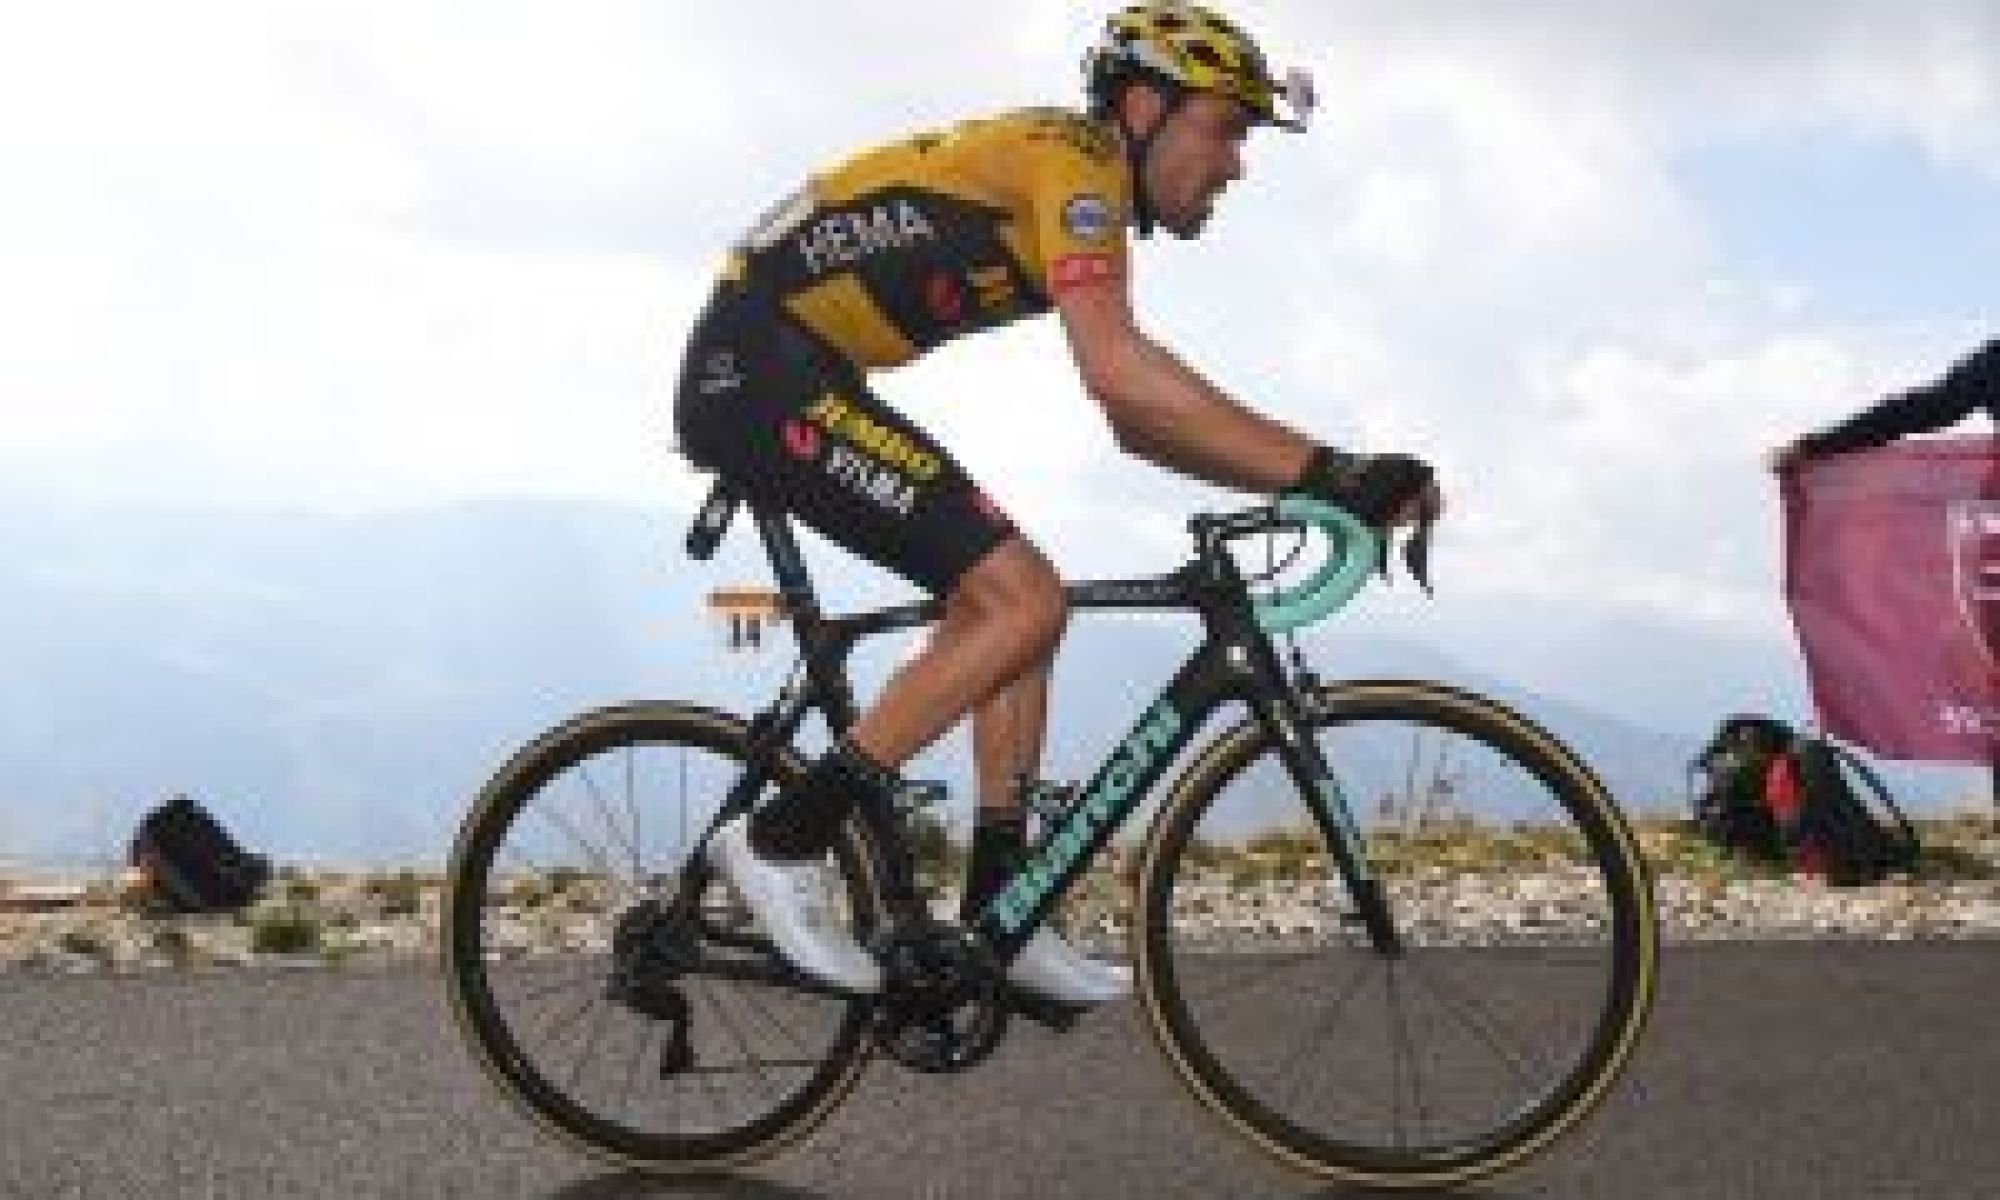 How to live stream the Vuelta a España 2020: Watch the Spanish Grand Tour